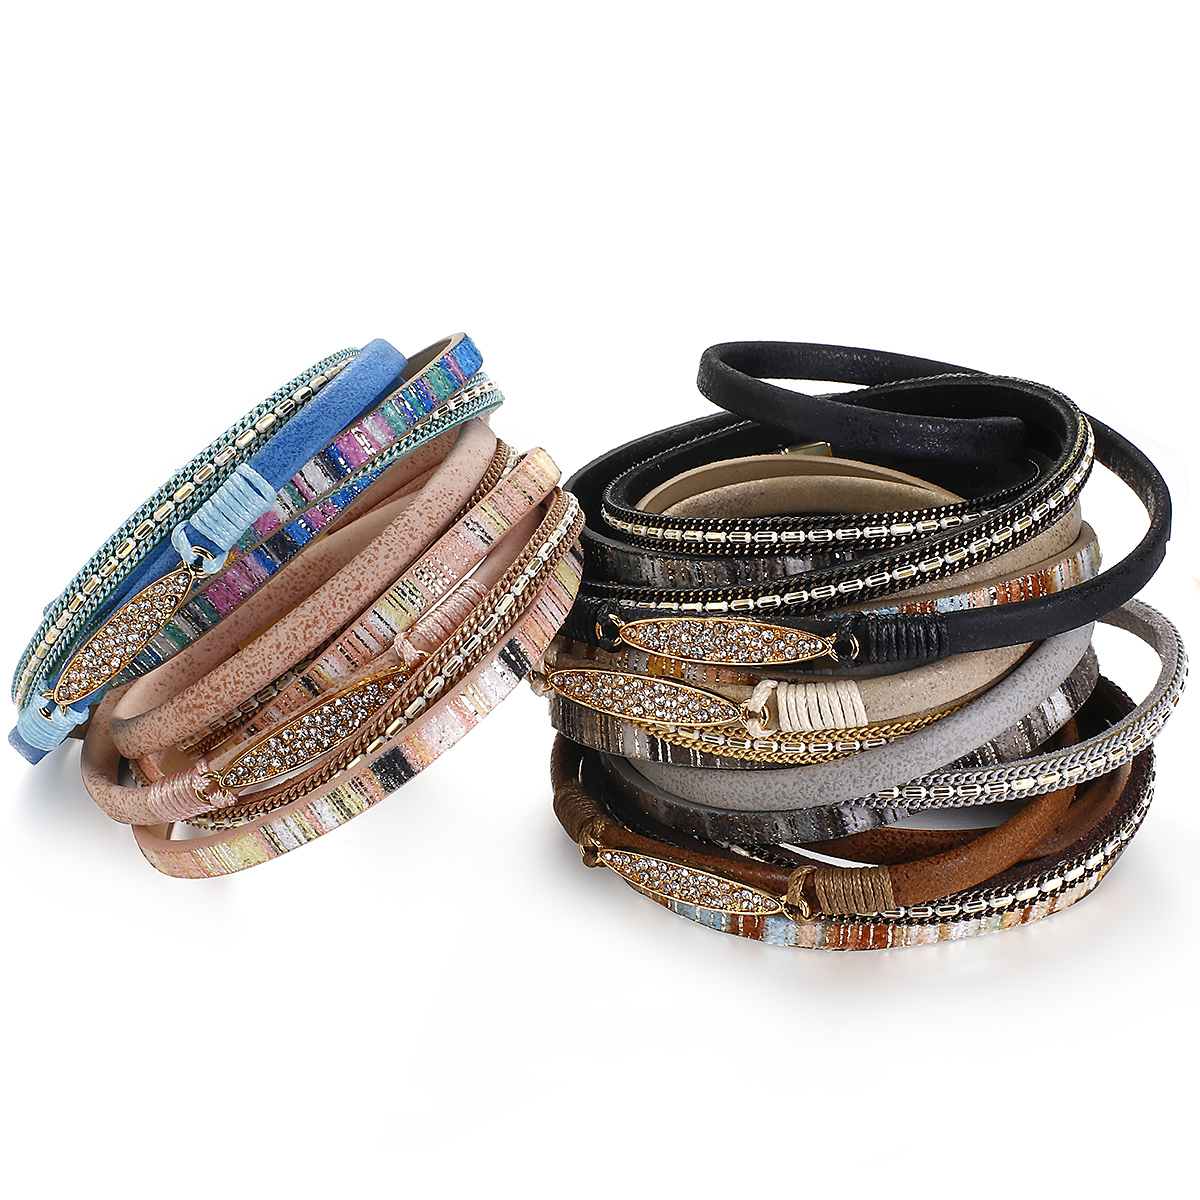 ALLYES Simple Stripe Leather Bracelet for Women Bohemian Natural stone Charm Crystal Wrap Bracelets Bangles Fashion Jewelry